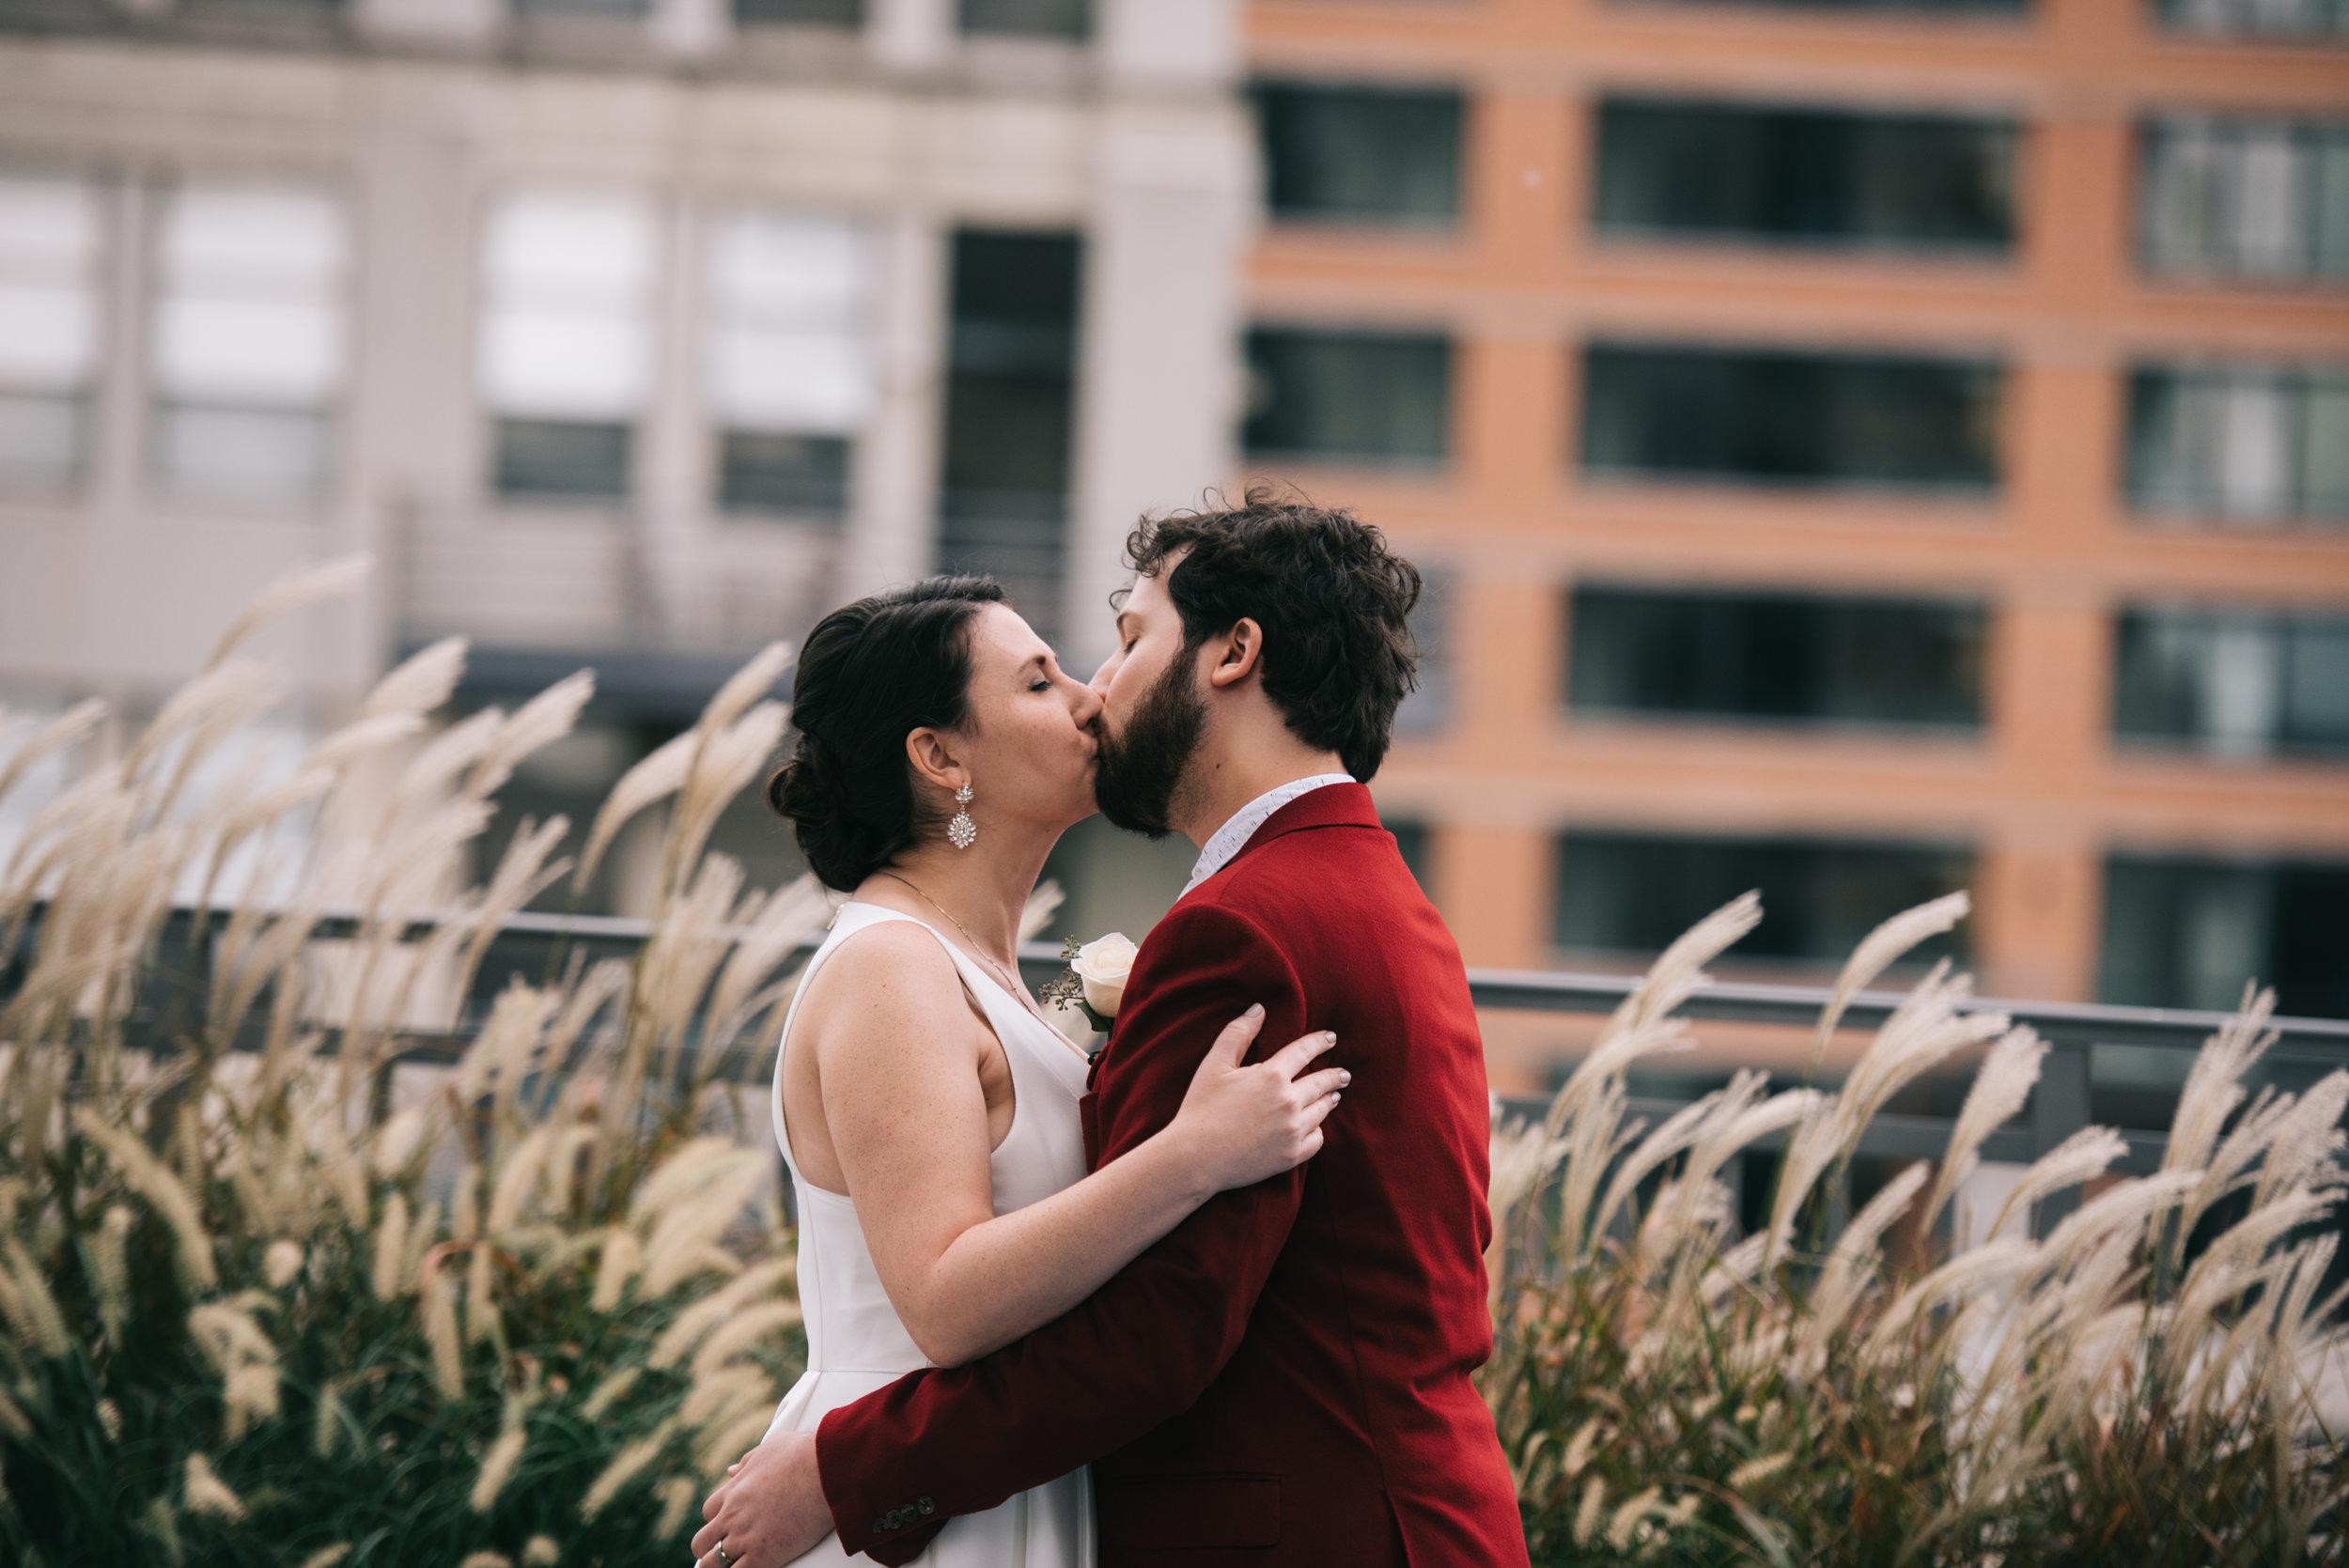 WeddingPhotos | NJPhotographer | Highlights-6-24.jpg